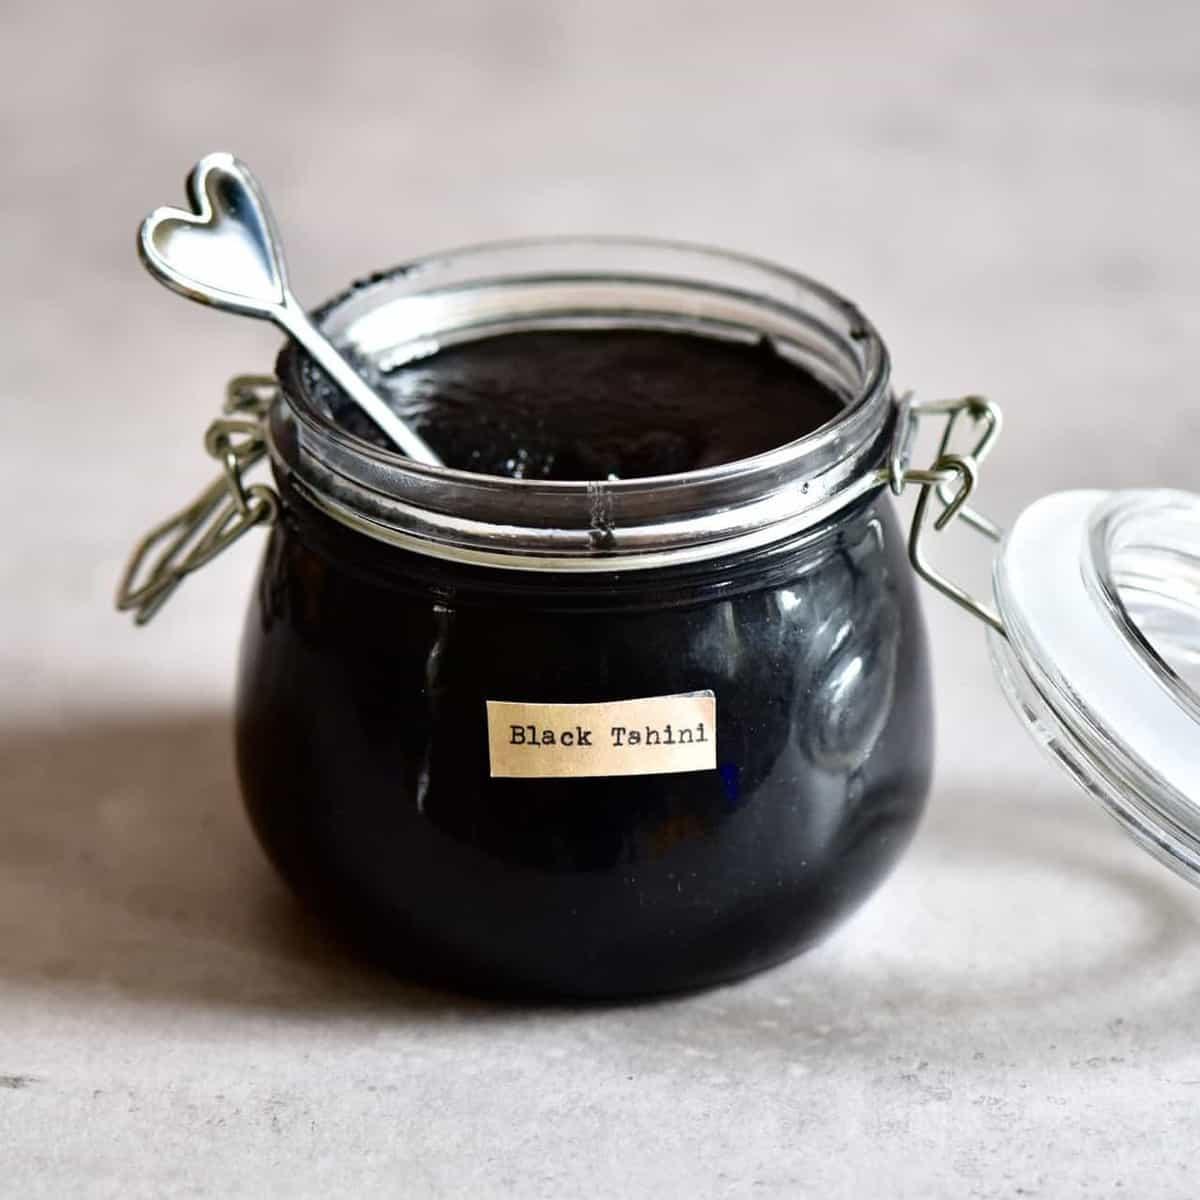 simple homemade black tahini recipe ( black sesame seed paste) in a jar